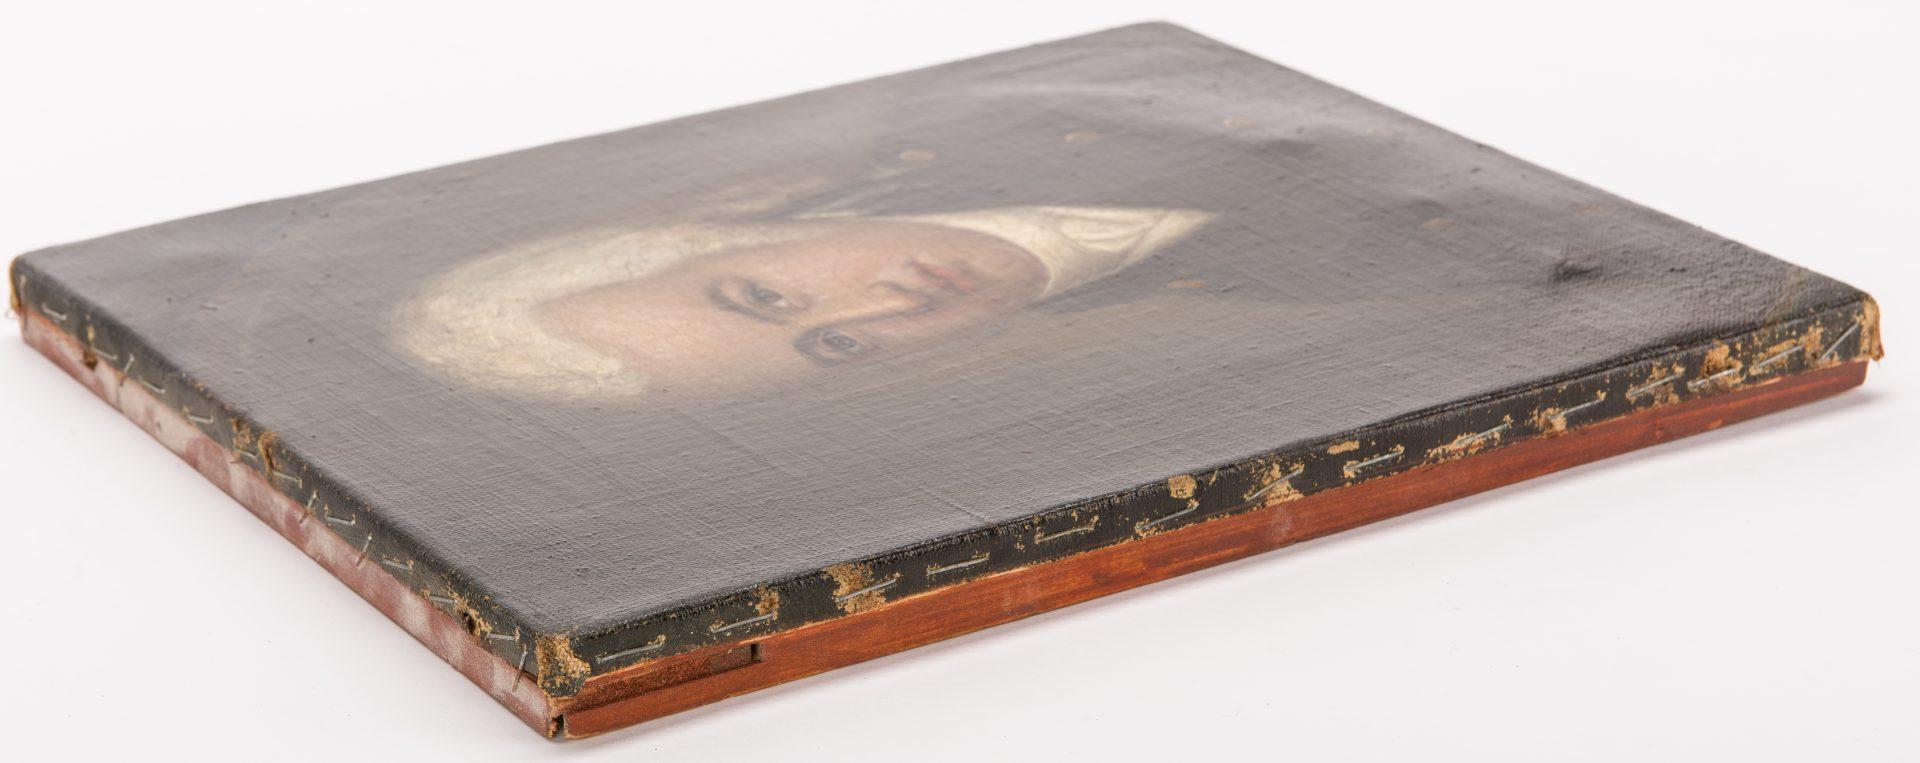 Lot 132: Portrait of a Revolutionary War Officer